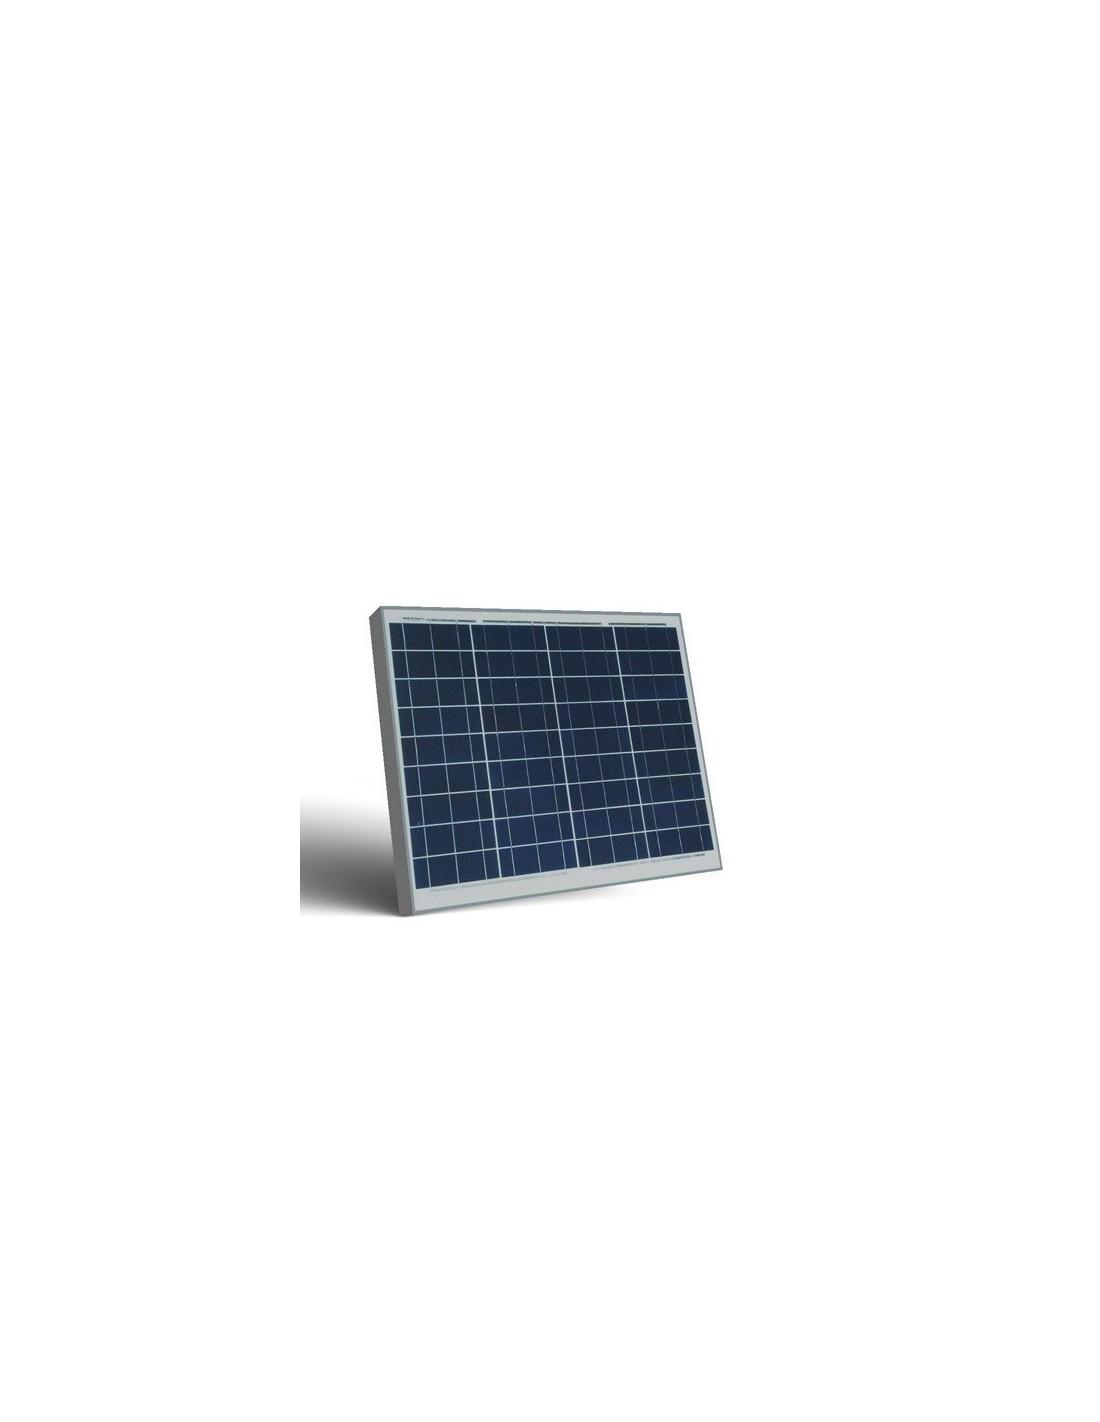 conjunto de 10 x 50w 12 placa solar panel fotovoltaico tot 500w camper. Black Bedroom Furniture Sets. Home Design Ideas